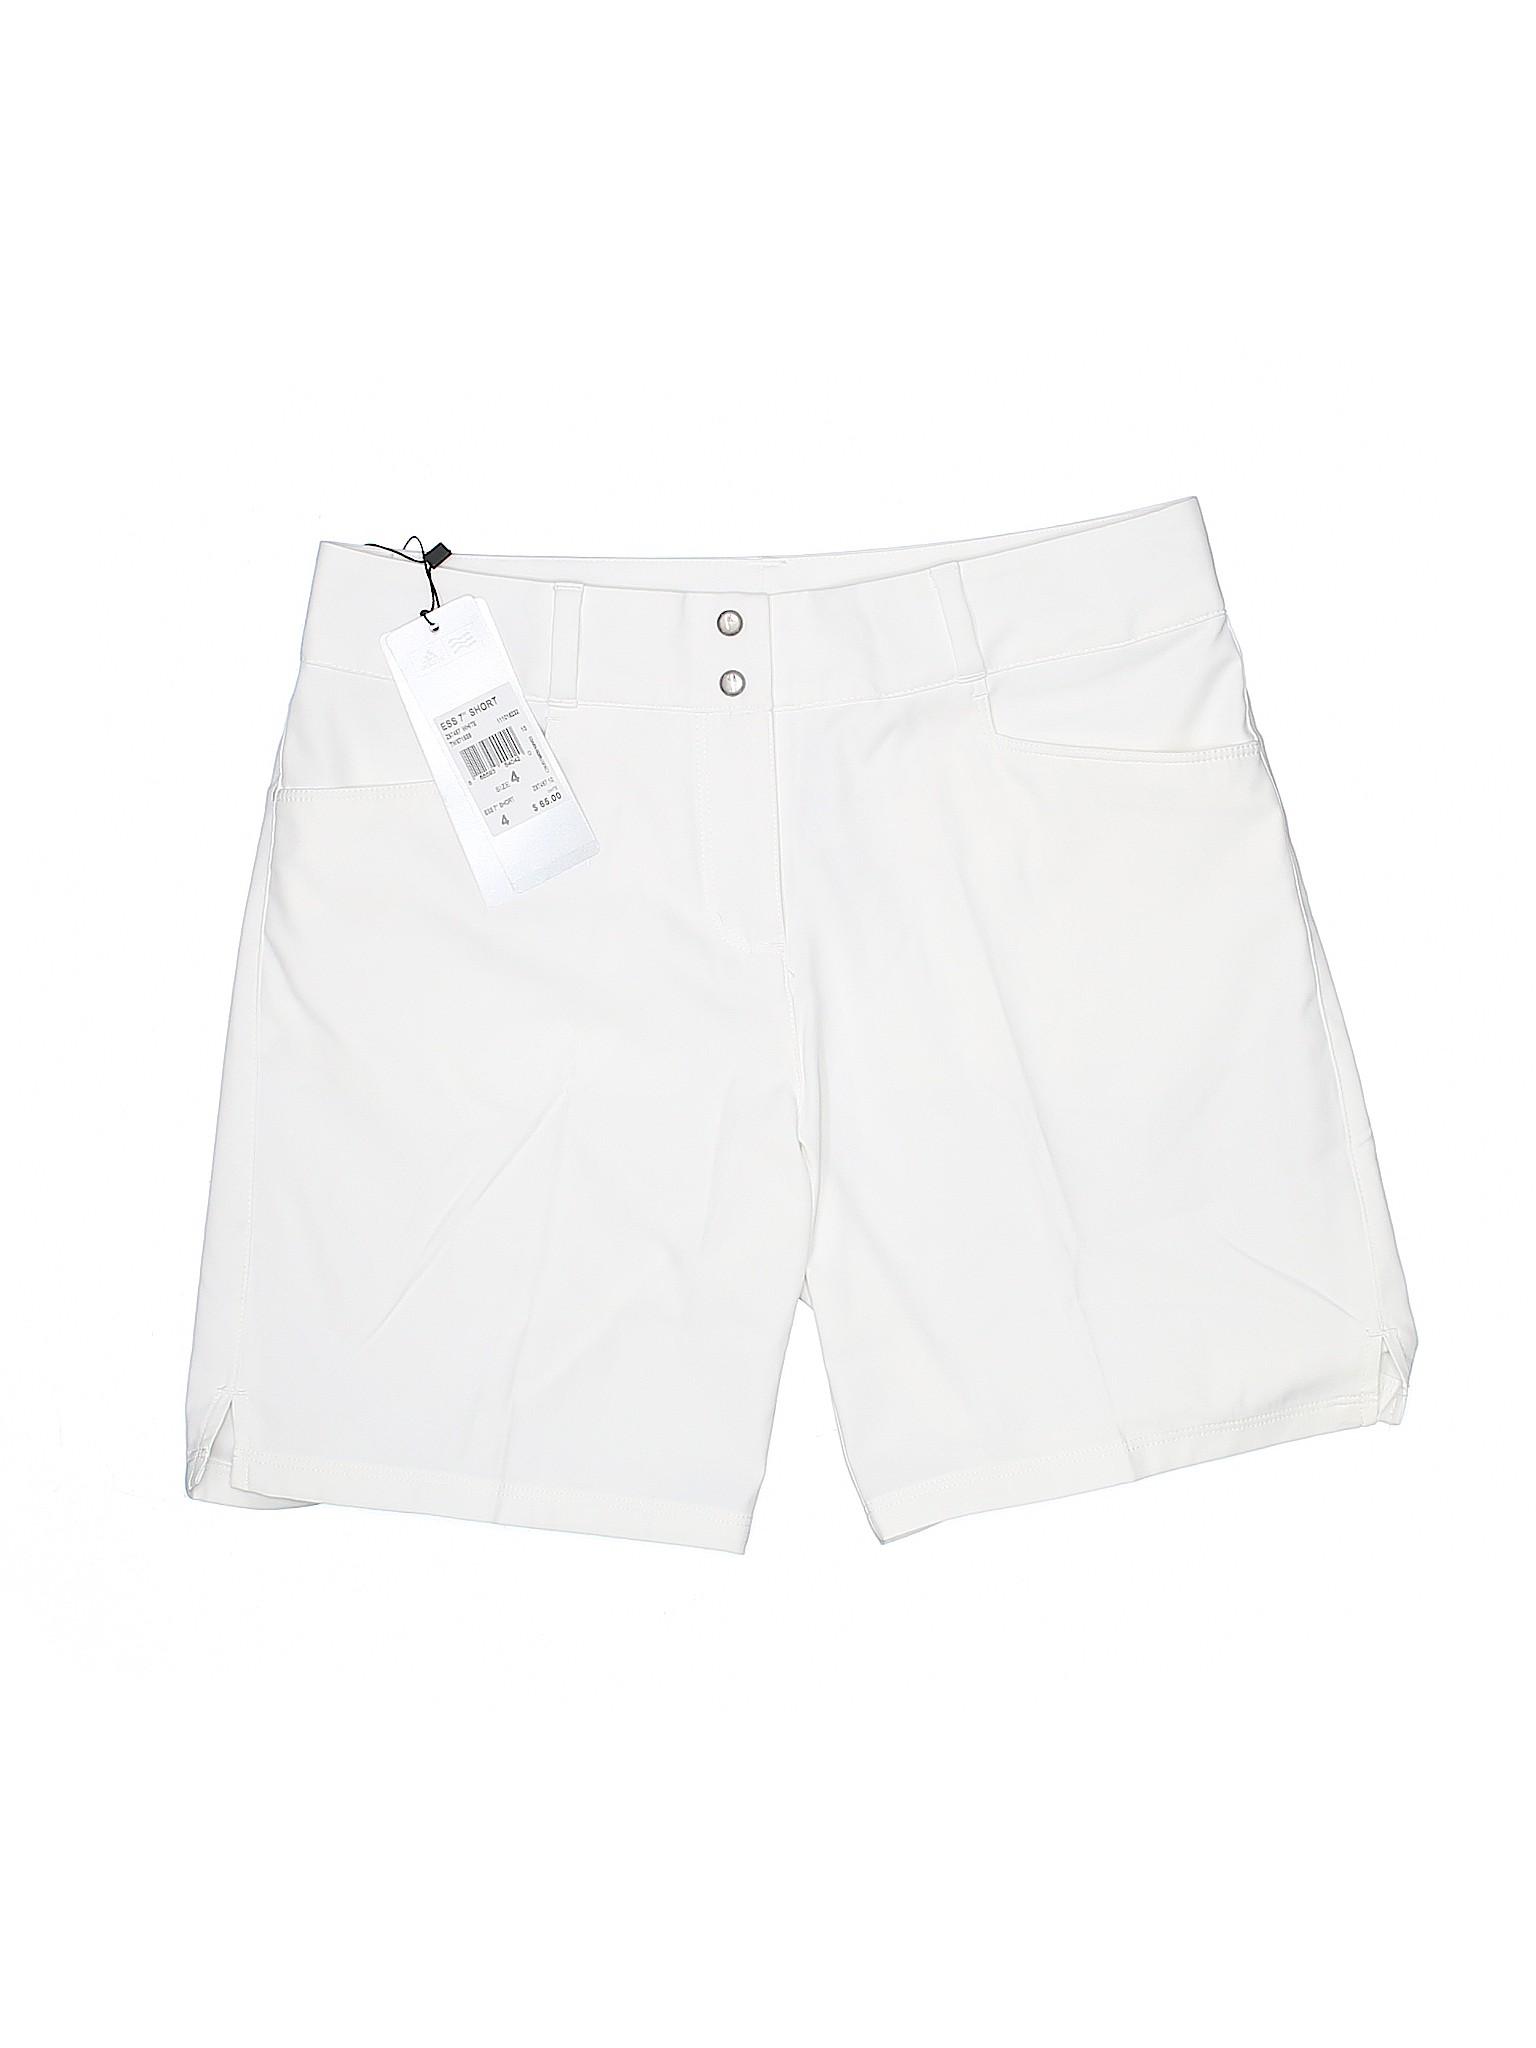 Boutique Adidas Athletic Adidas Shorts Boutique Oq6dwq